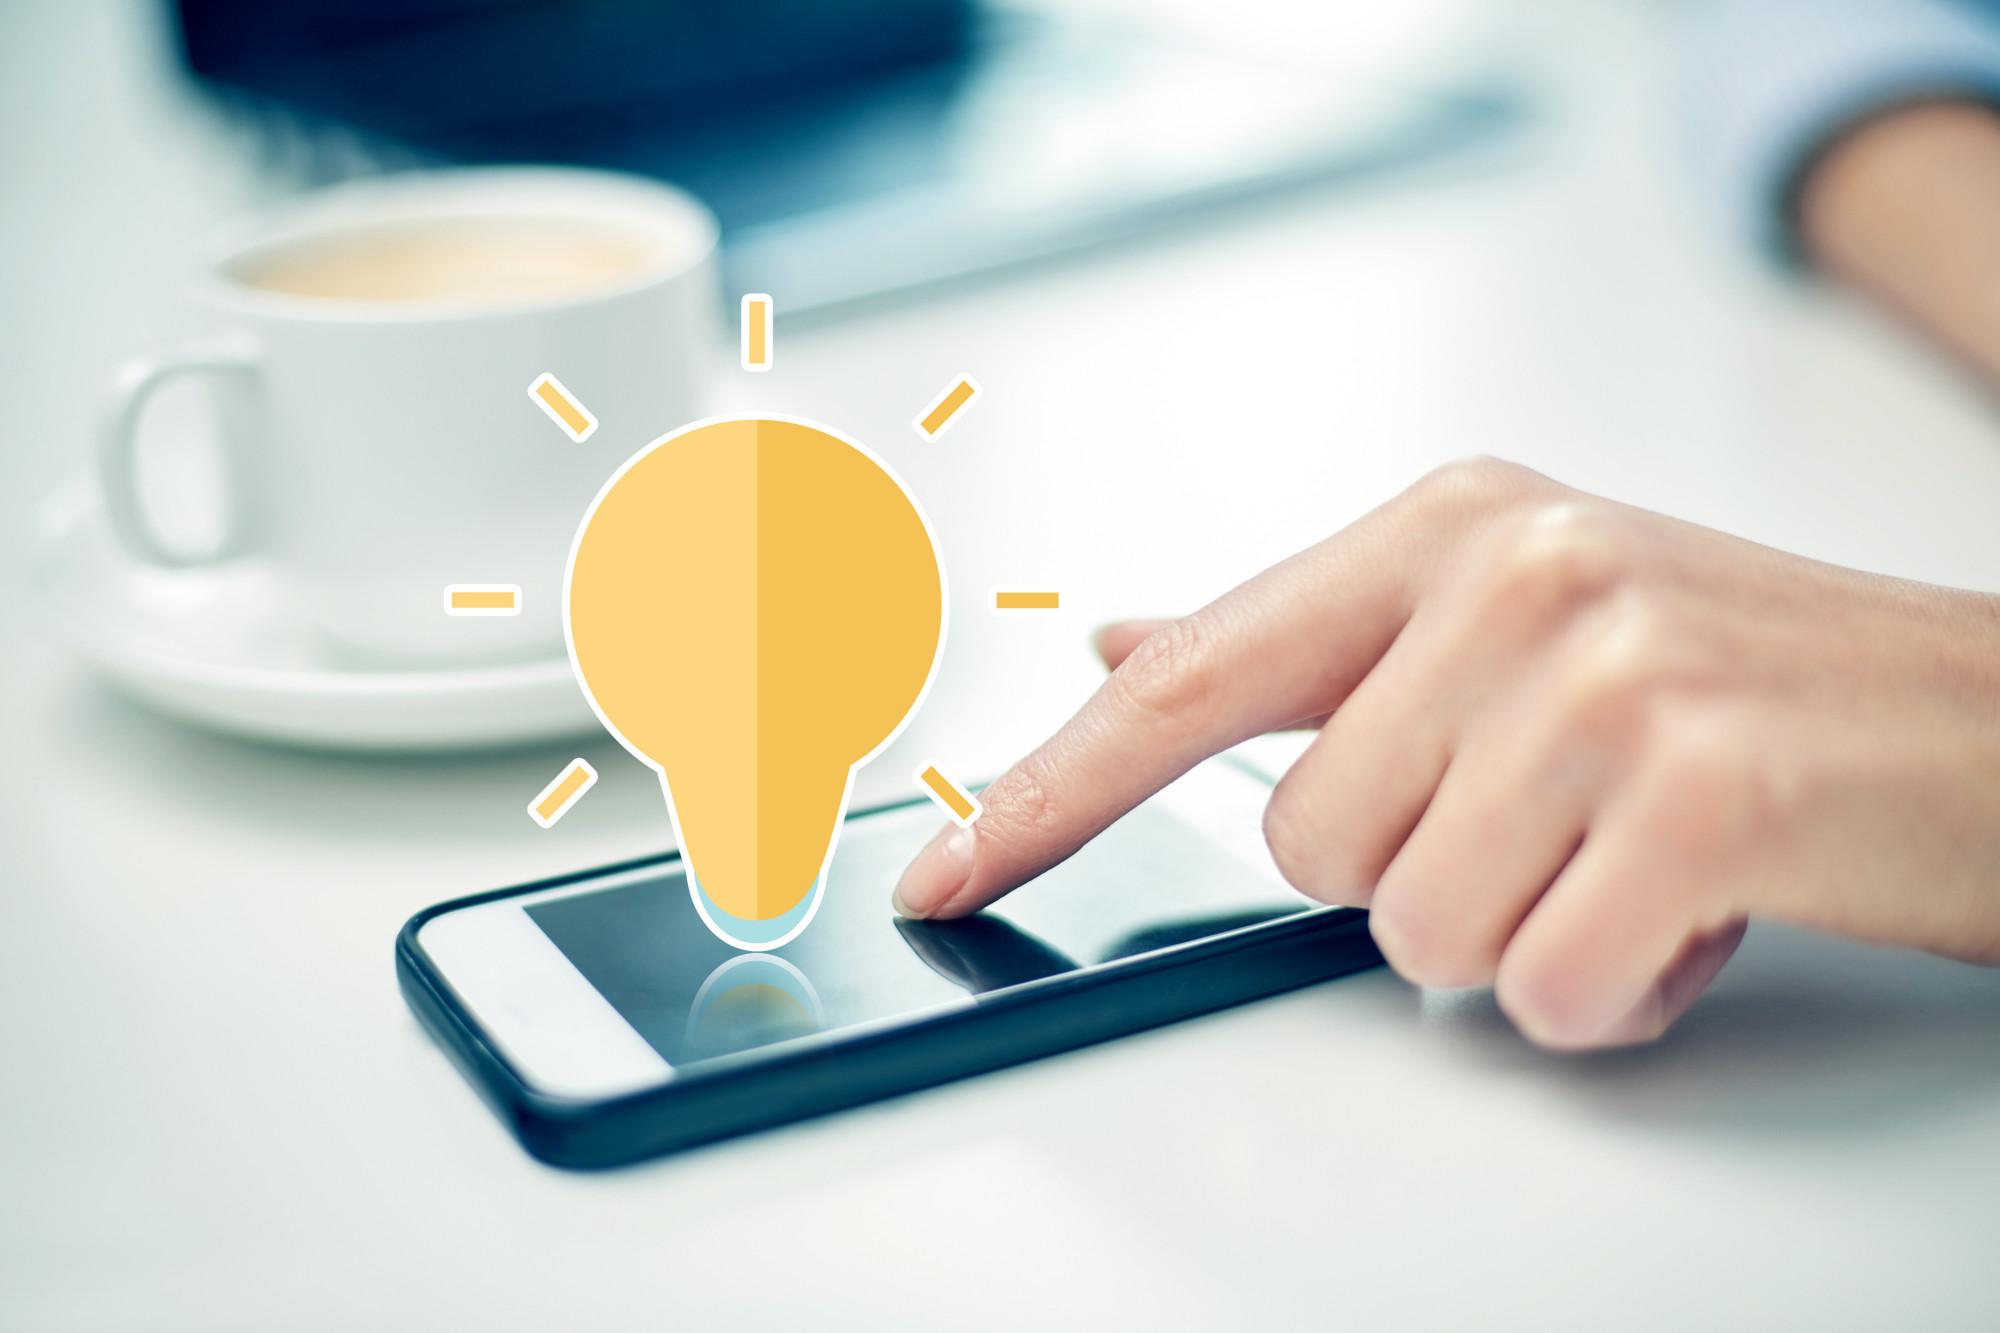 I Have an Idea for an App!: 4 Ways to Know if It's Any Good